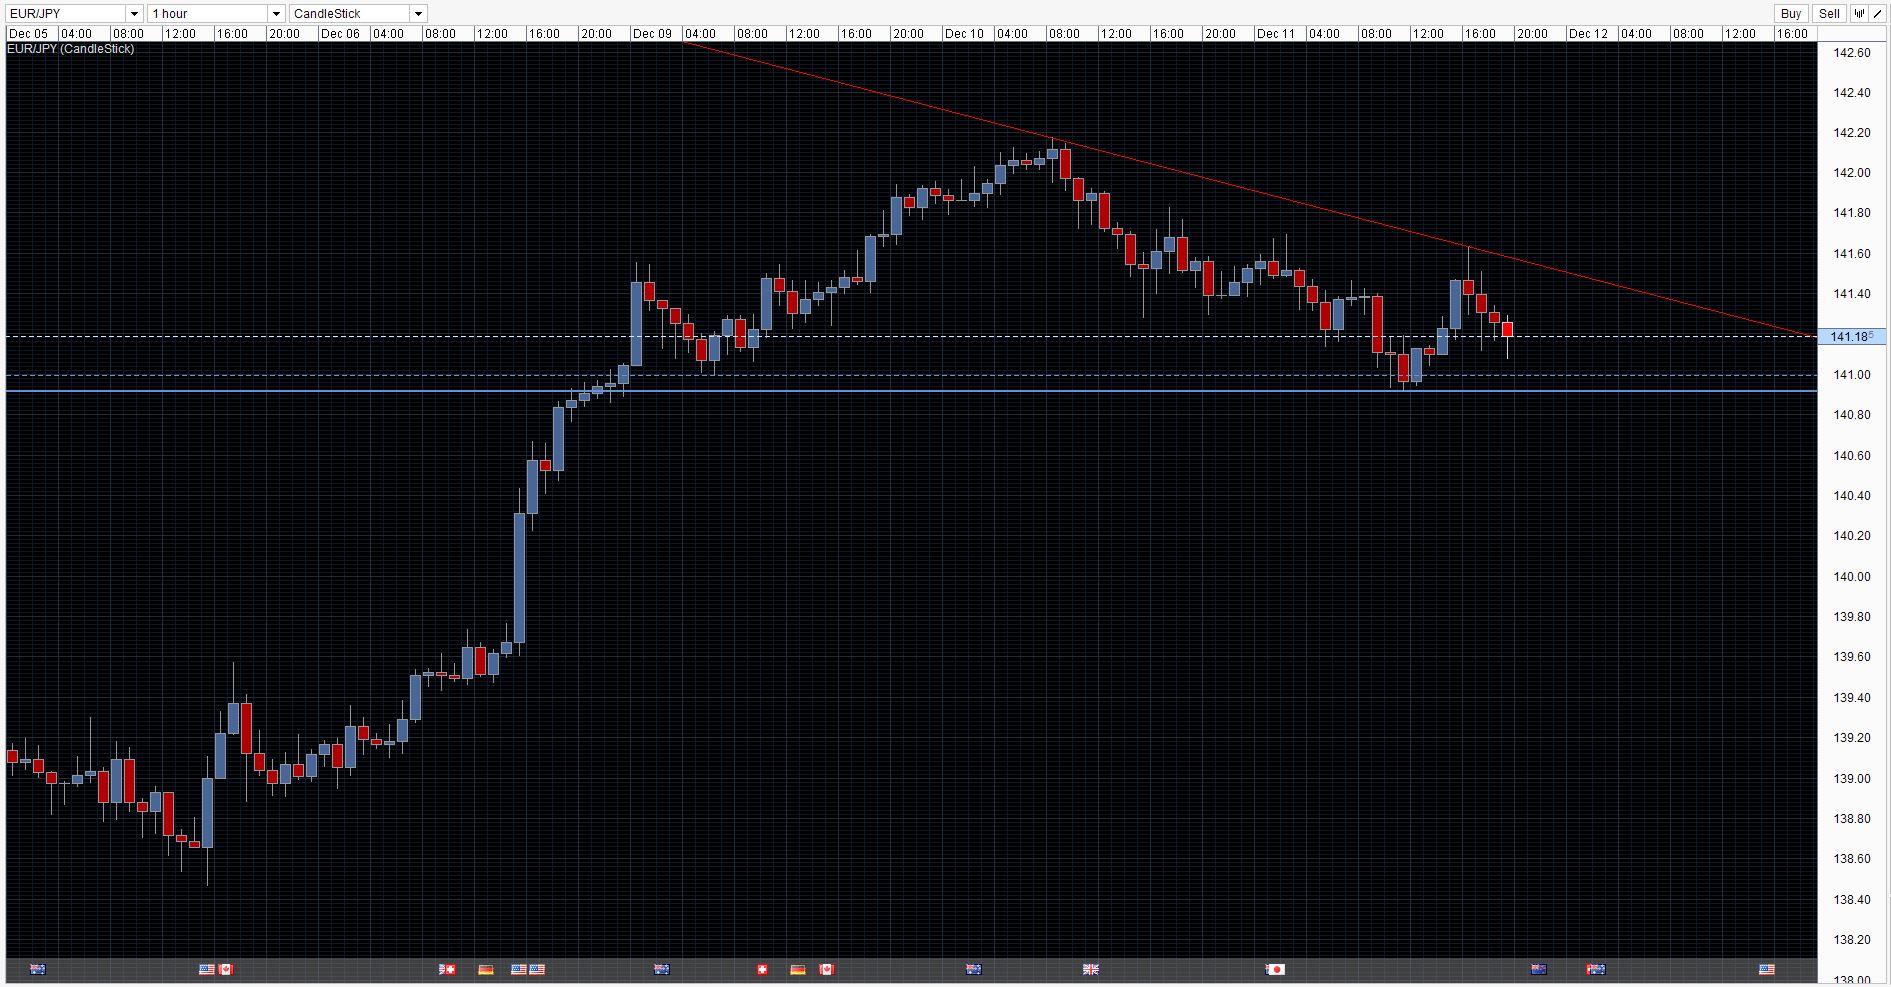 EUR/JPY Chart 11/12/2013